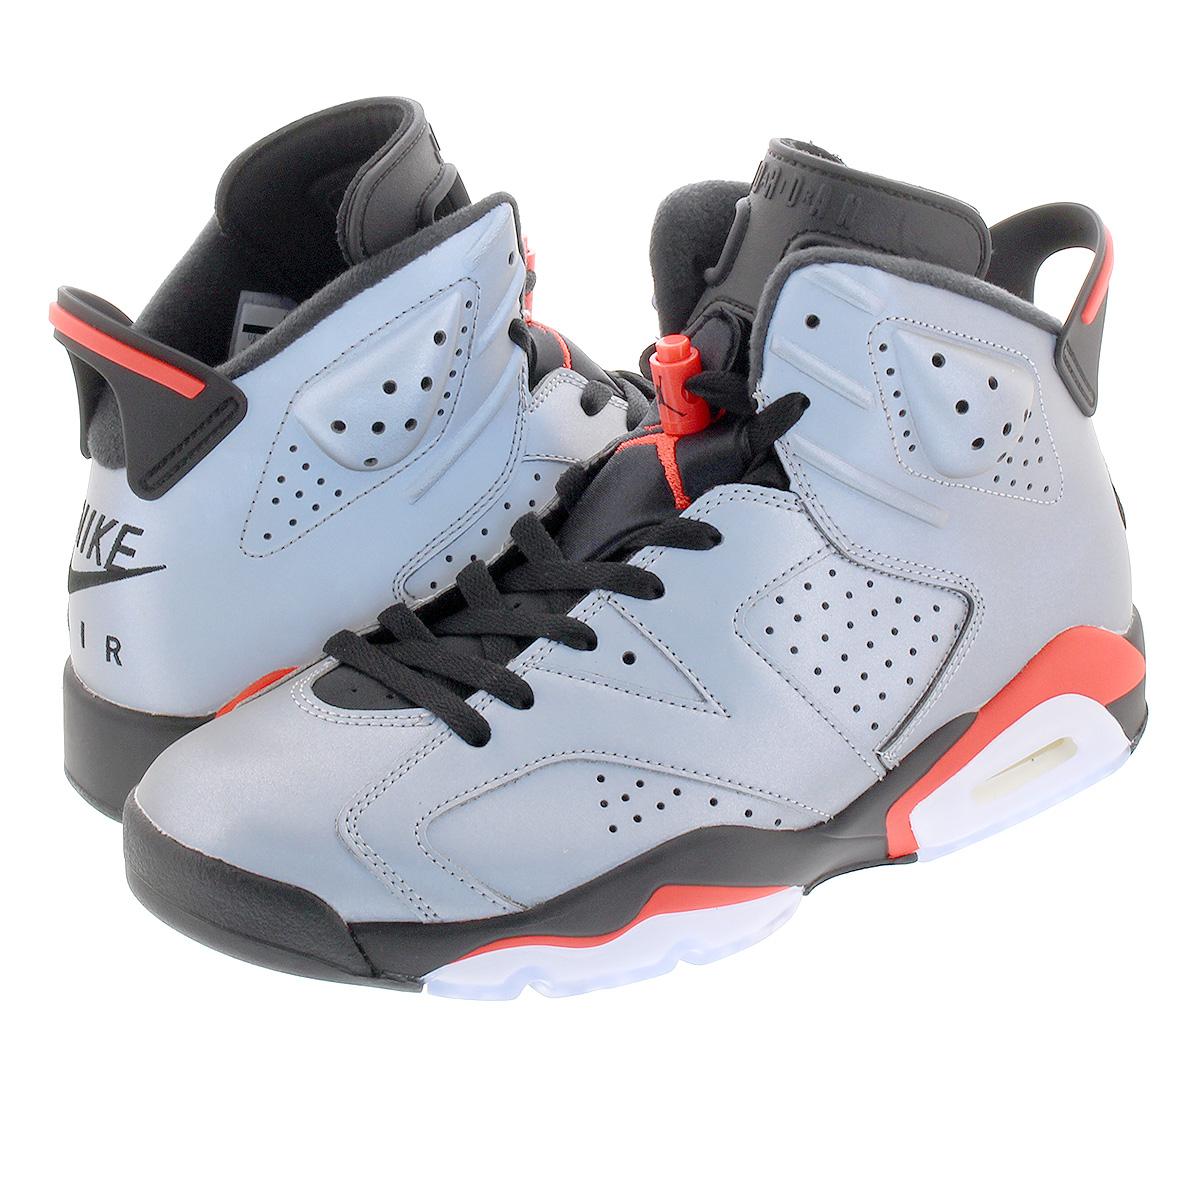 détaillant en ligne ad2b4 18b71 NIKE AIR JORDAN 6 RETRO SP Nike Air Jordan 6 nostalgic SP REFLECT  SILVER/INFRARED/BLACK ci4072-001